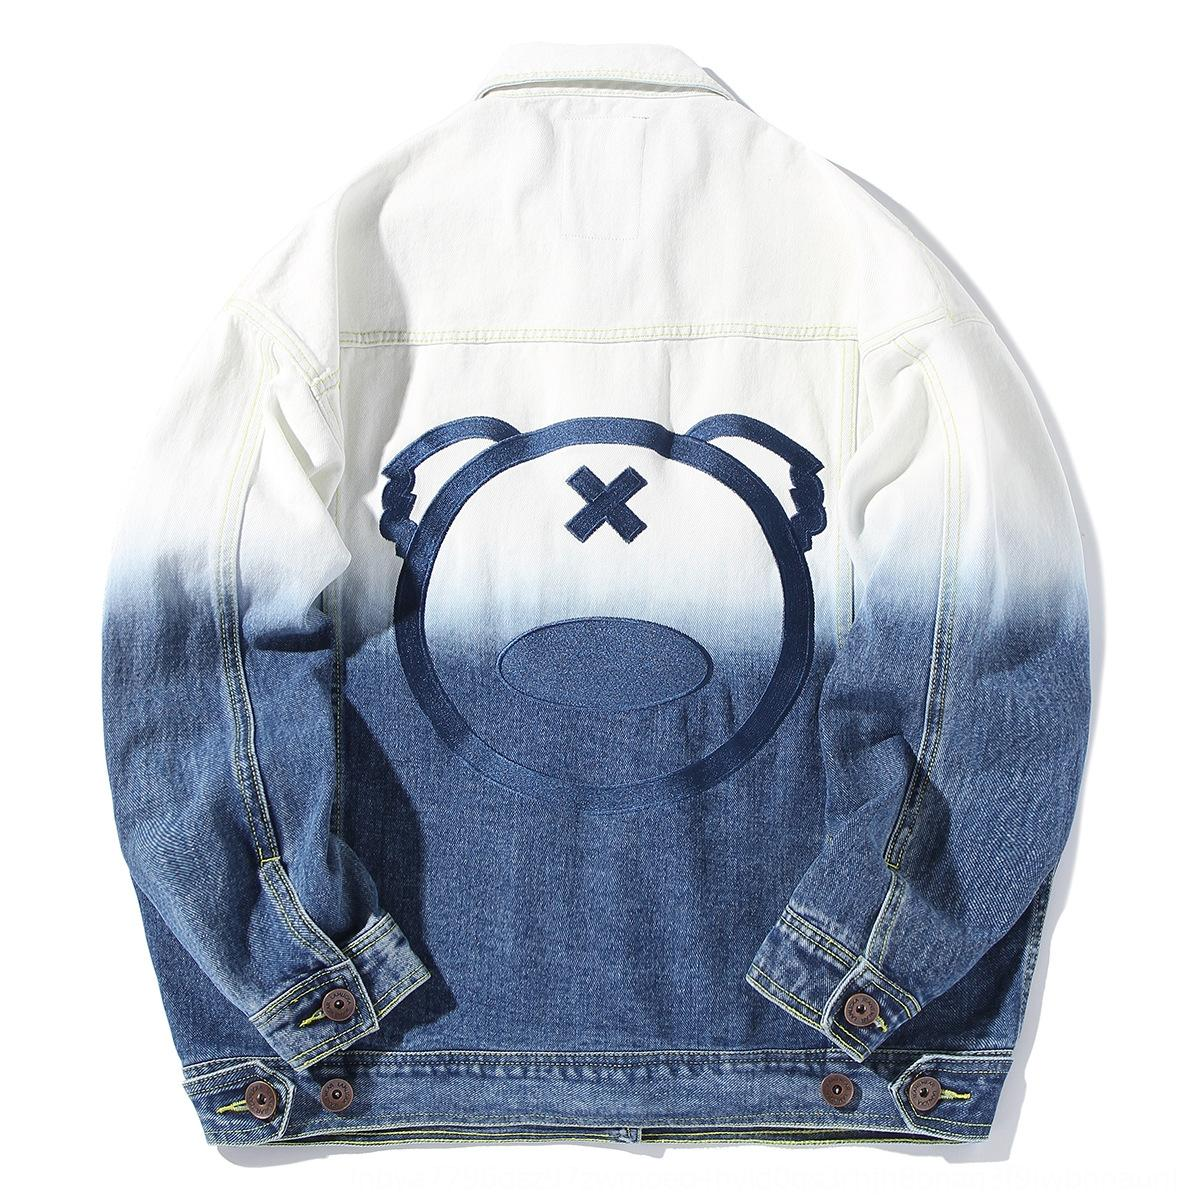 Primavera New panda bordado lavado gradiente denim moda masculina jovem solta jaqueta jeans jaqueta C4JjG